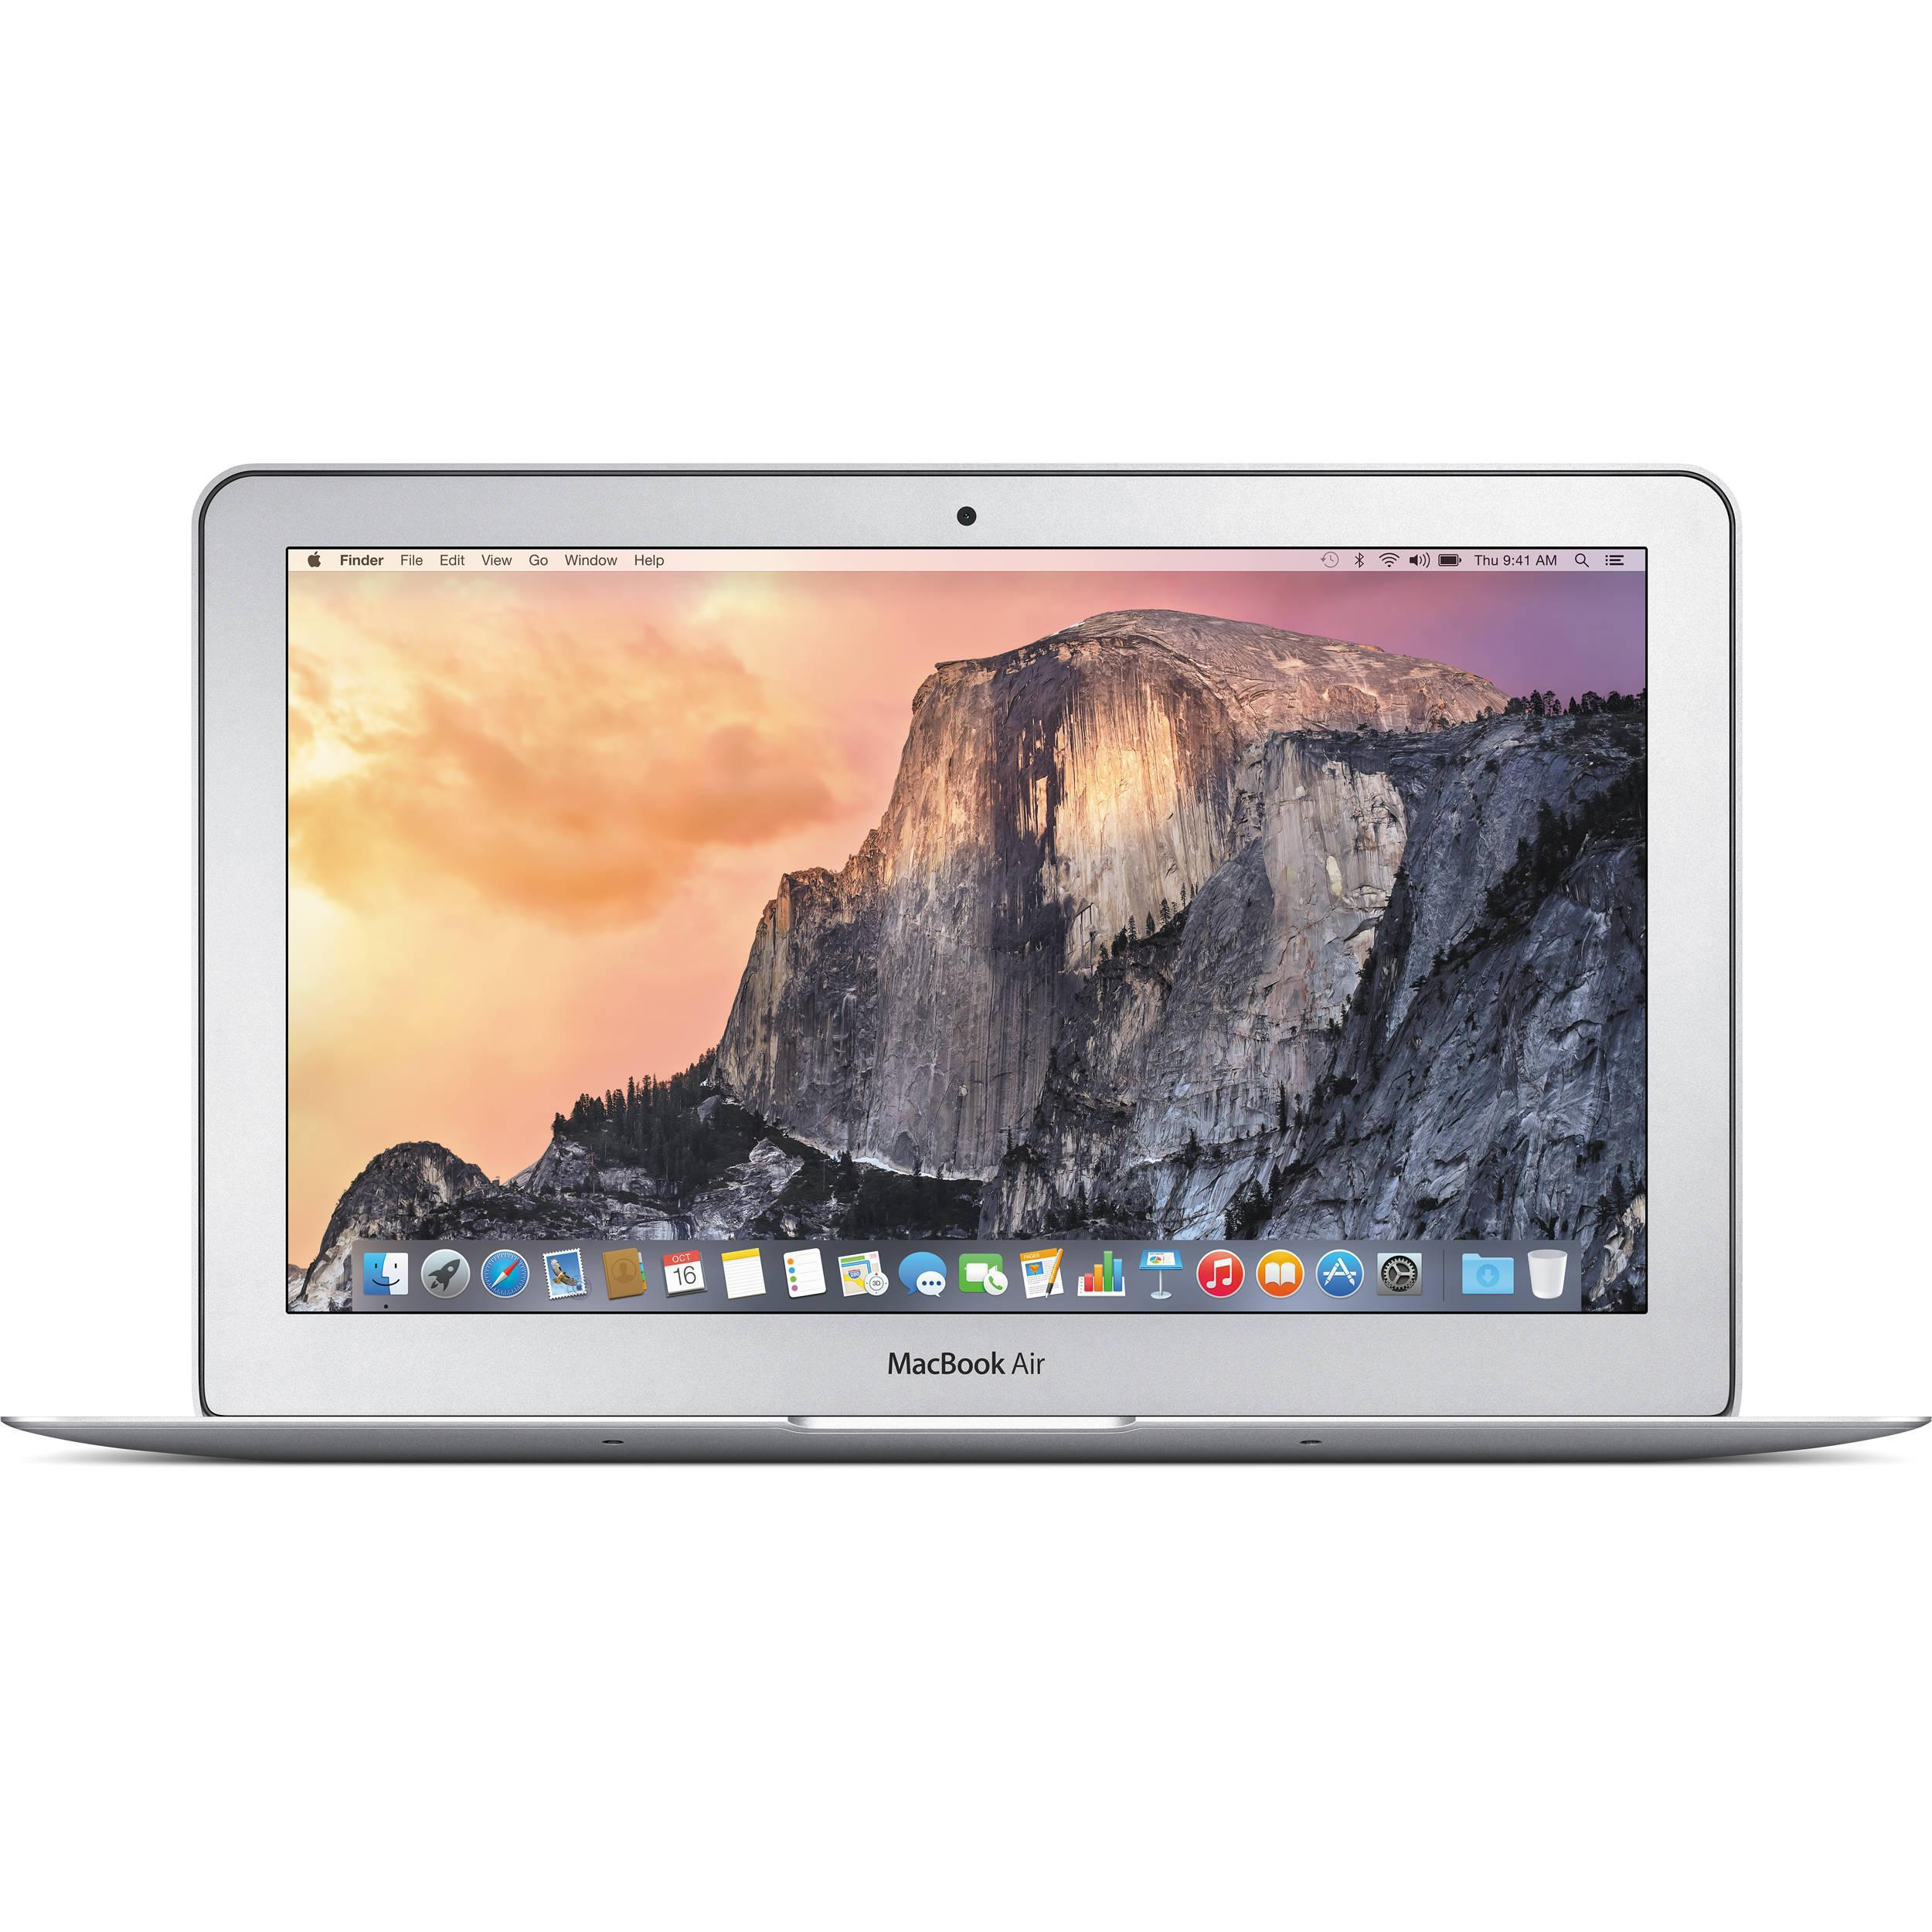 MacBook Air 11,6-tum (2014) - Core i5 - 8GB - SSD 128 GB QWERTY - Engelska (USA)